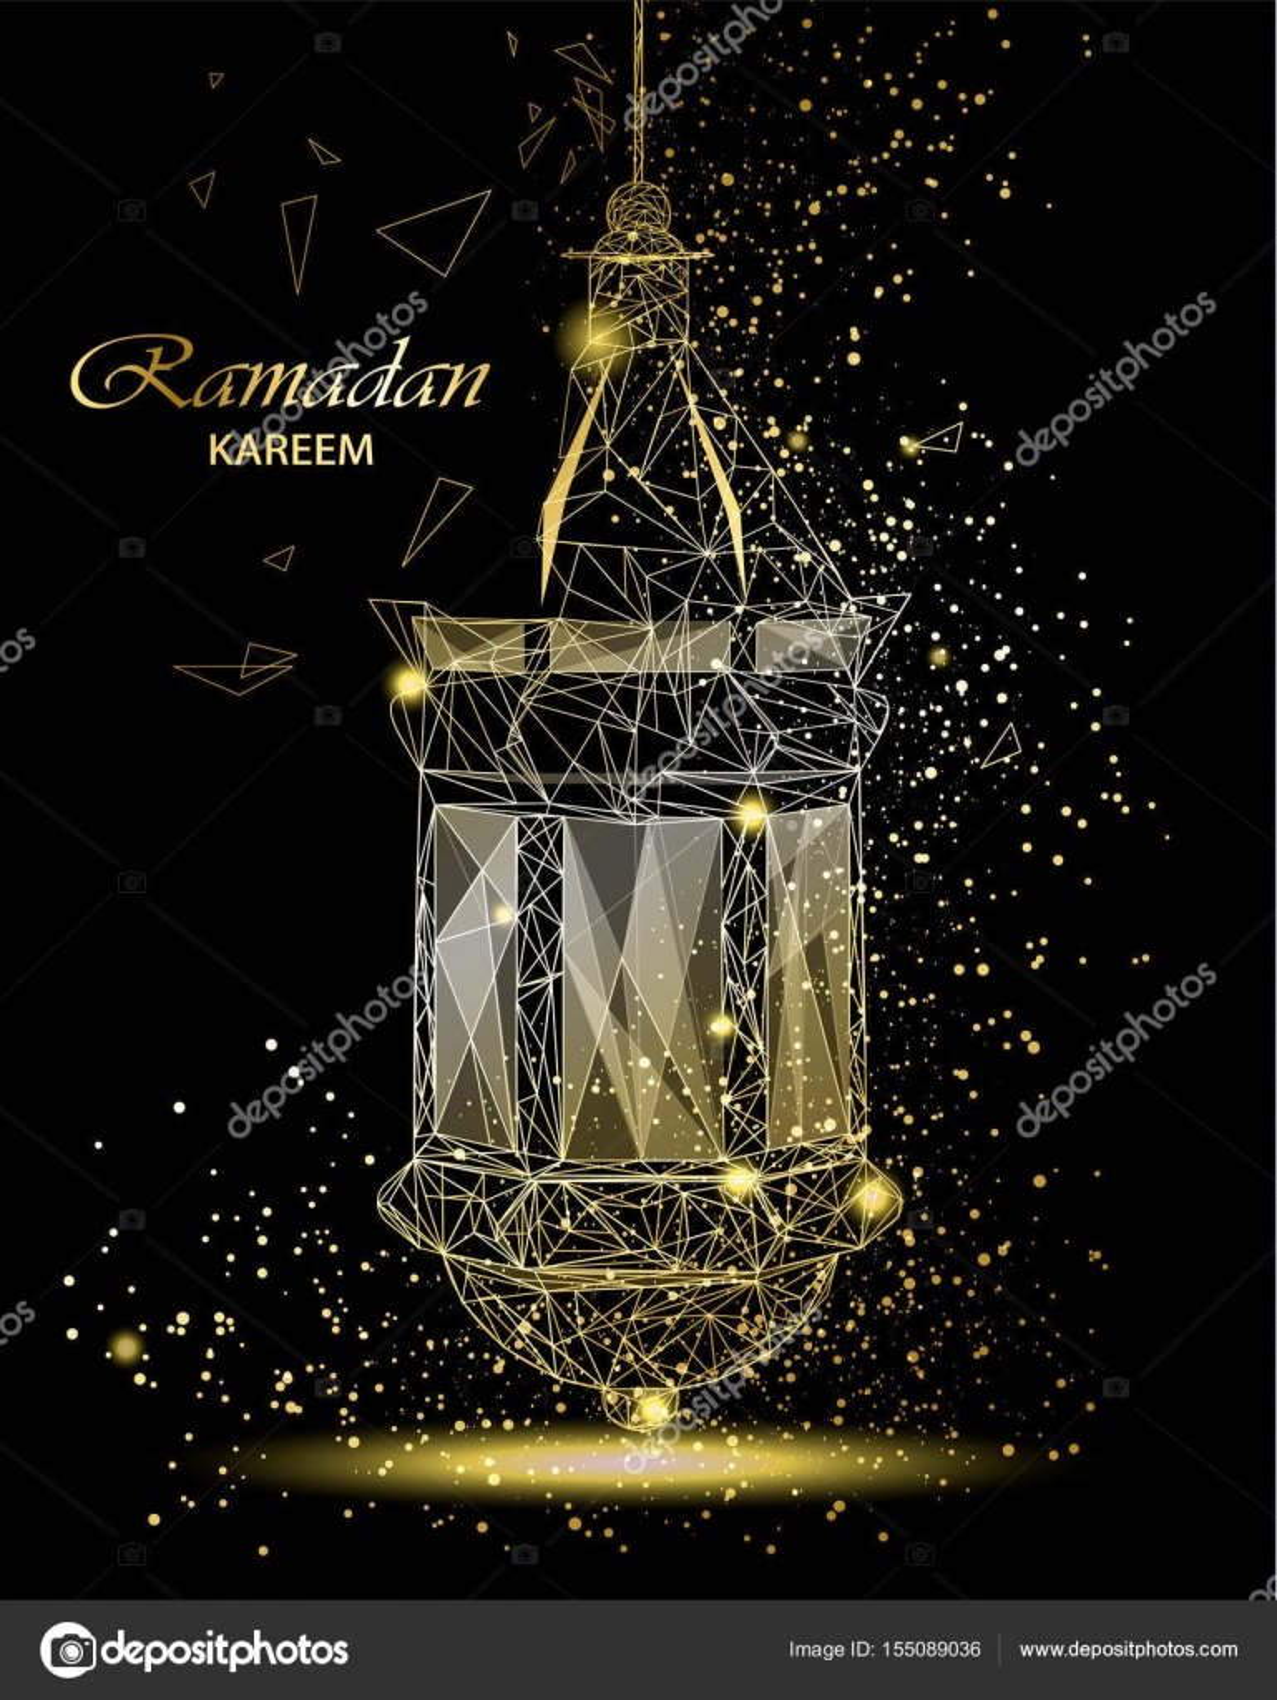 Ramadan kareem beautiful greeting card with traditional arabic ramadan kareem beautiful greeting card with traditional arabic lantern polygonal art on black background m4hsunfo